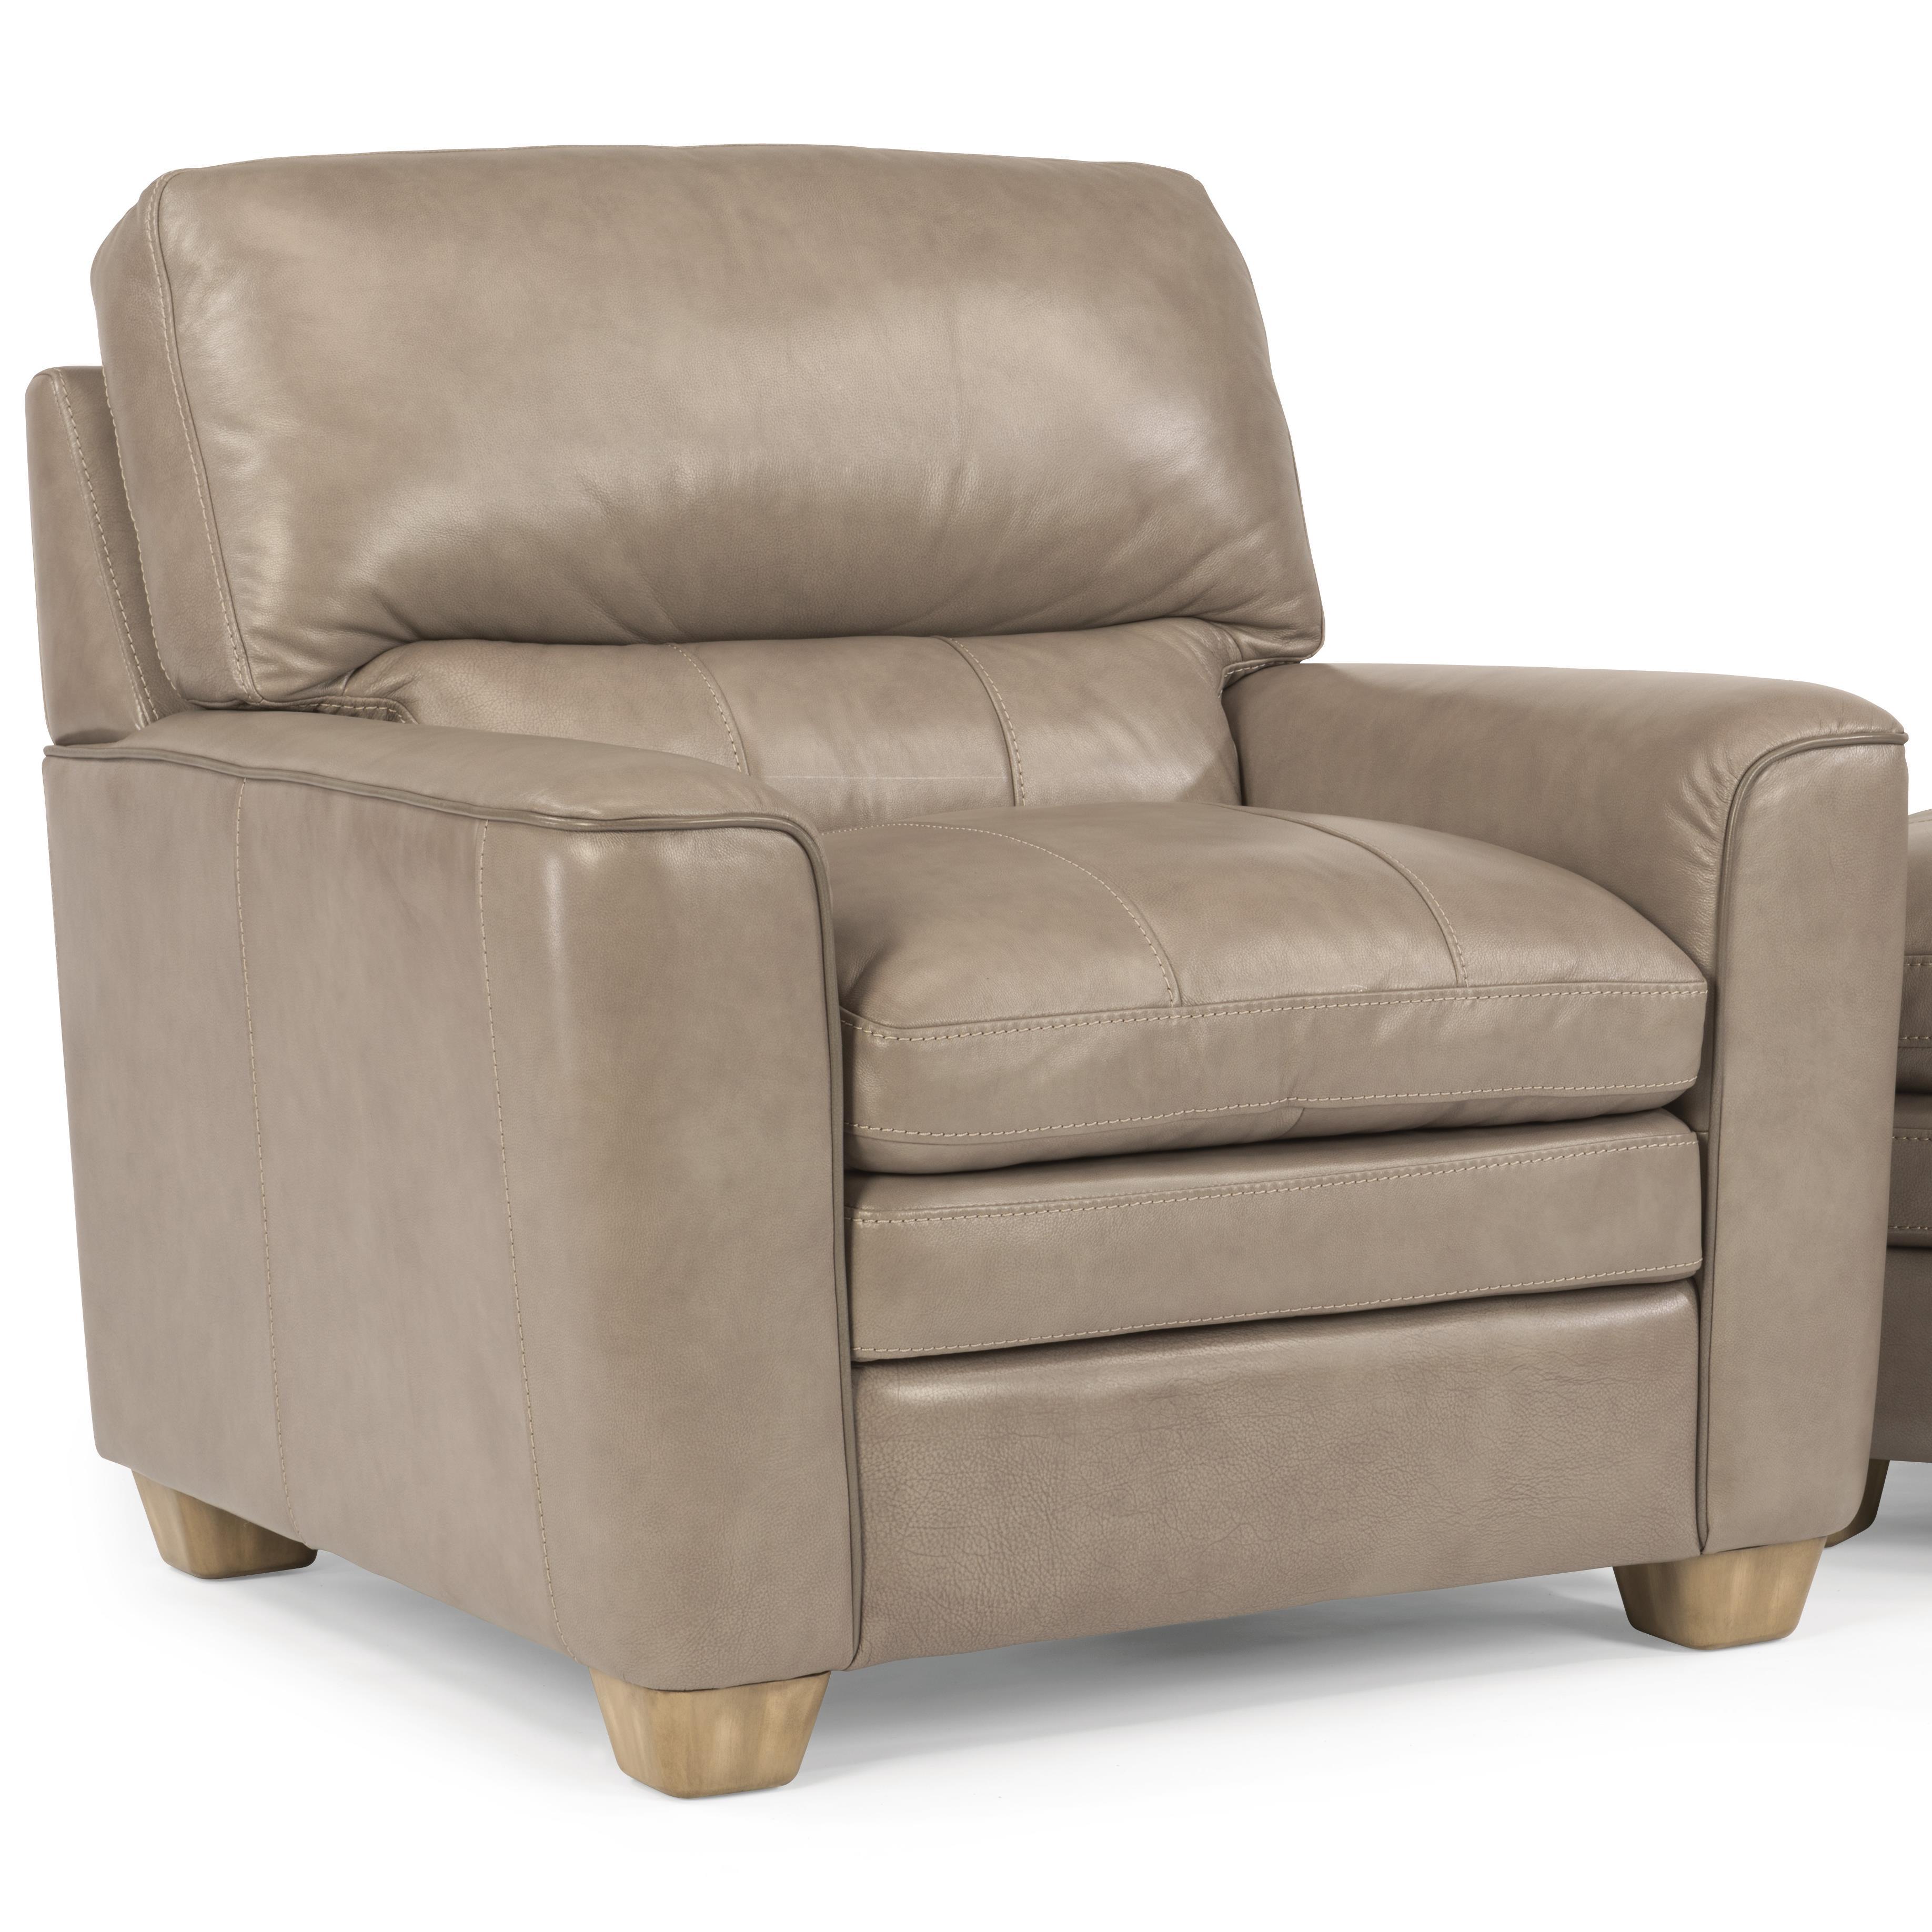 Flexsteel Latitudes-Ivy Chair - Item Number: 1304-10-739-01